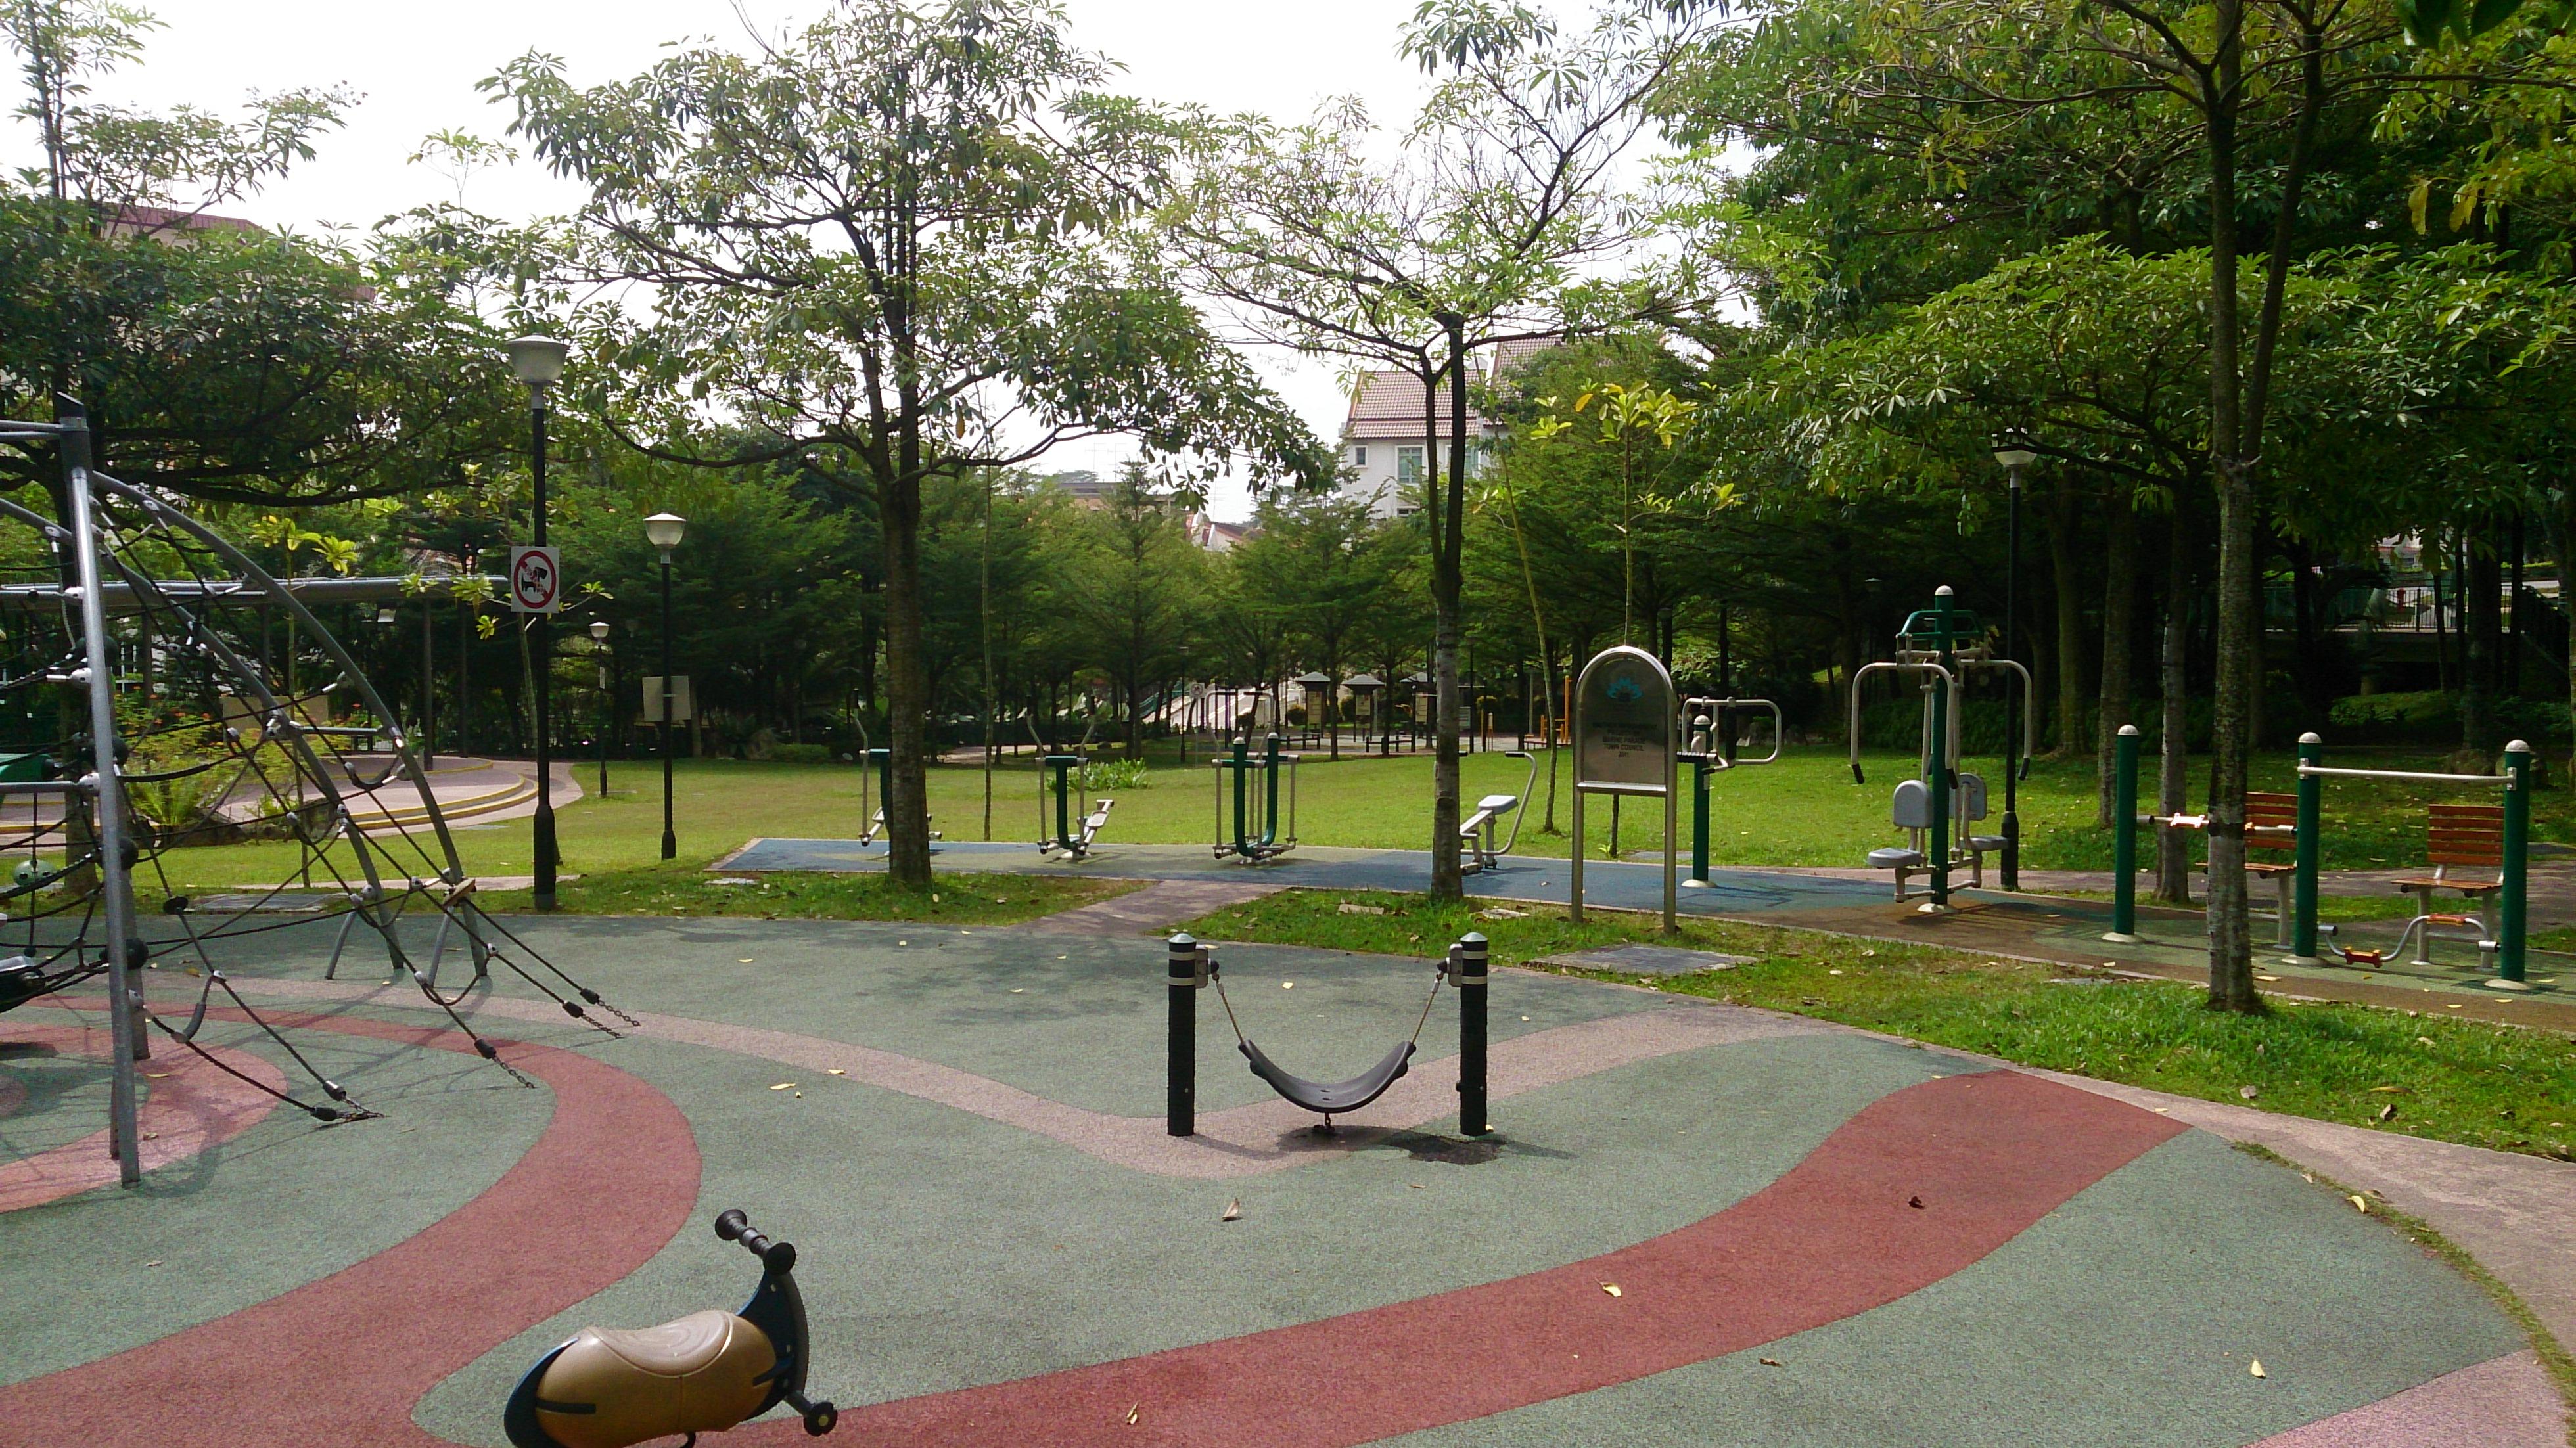 File:Sunshine park, Serangoon, Singapore.jpg - Wikimedia Commons